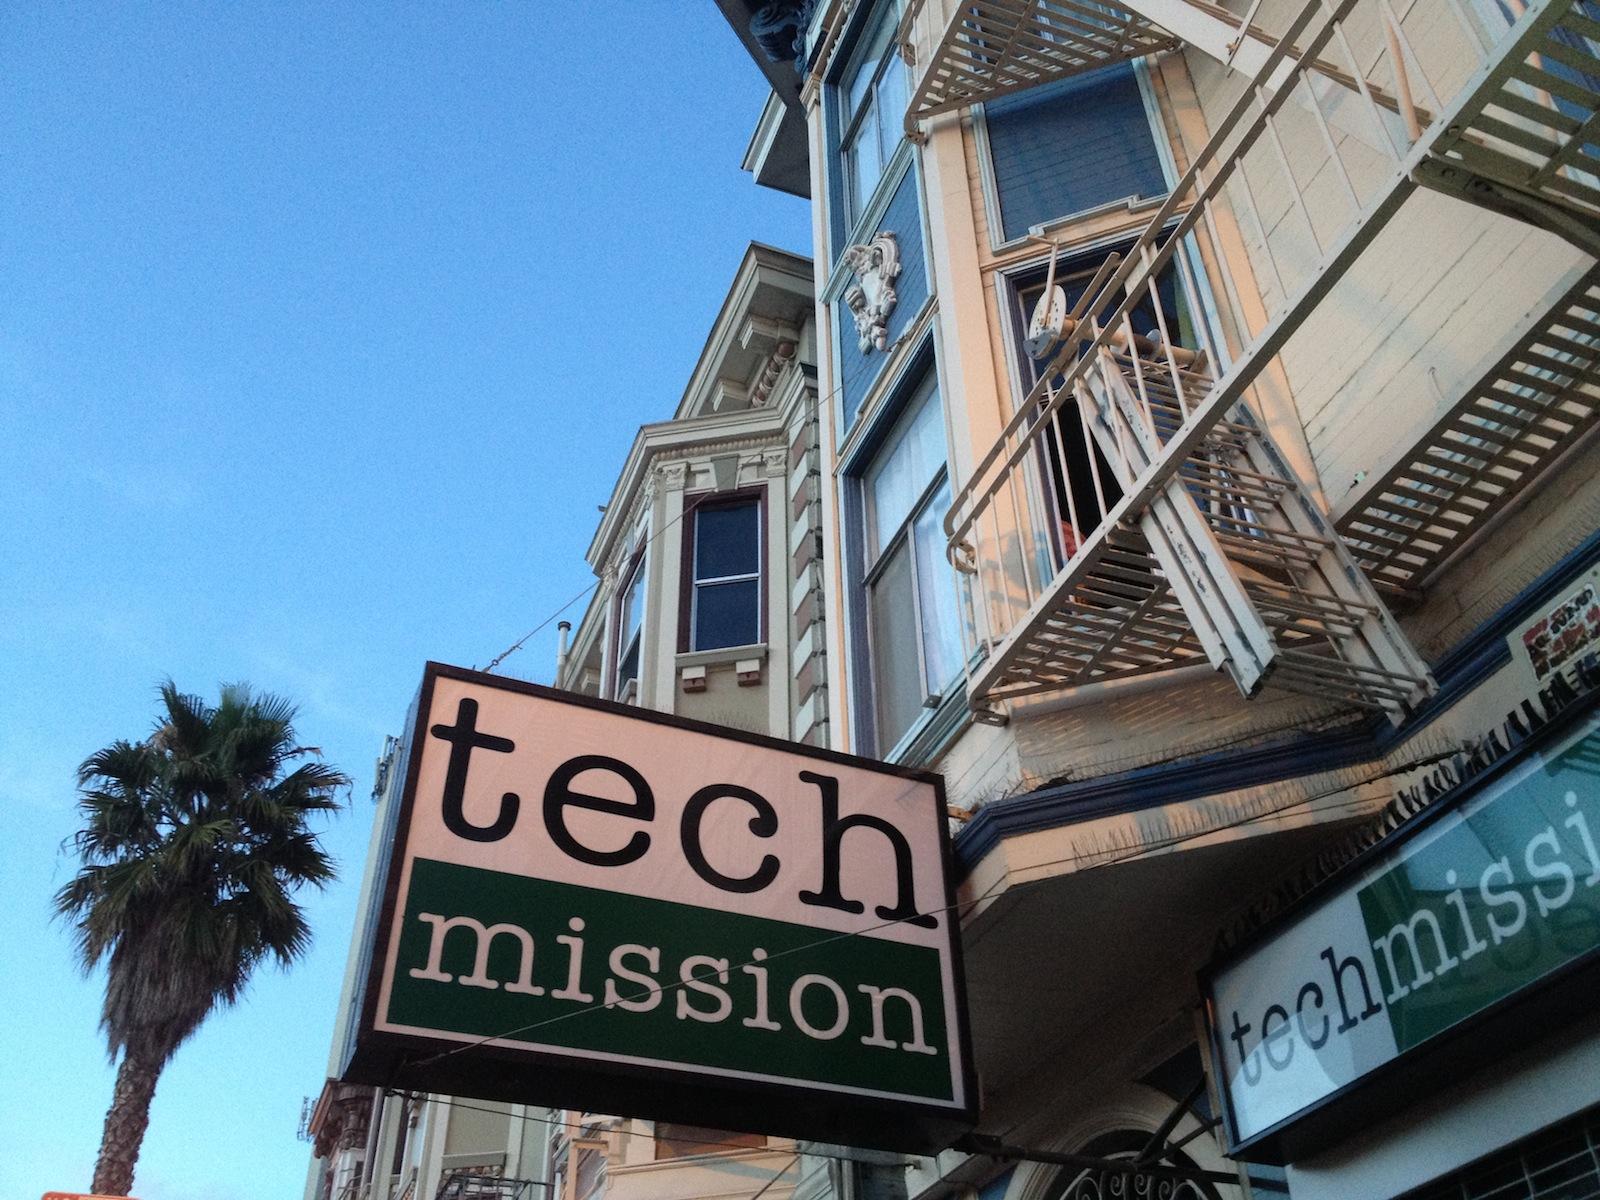 SNAP: Tech Mission